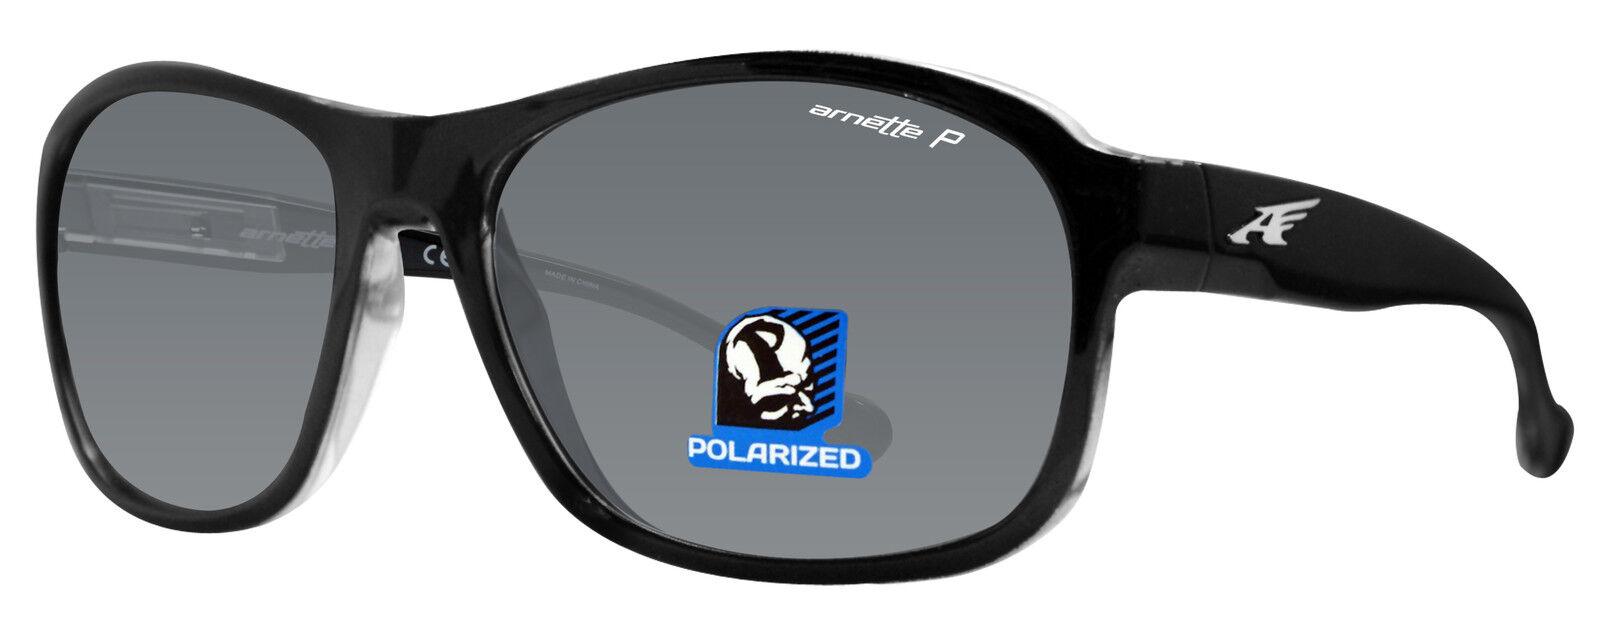 c75f7a3d71 Arnette Polarized Sunglasses Uncorked An4209 2159 81 Black grey Lens 59mm